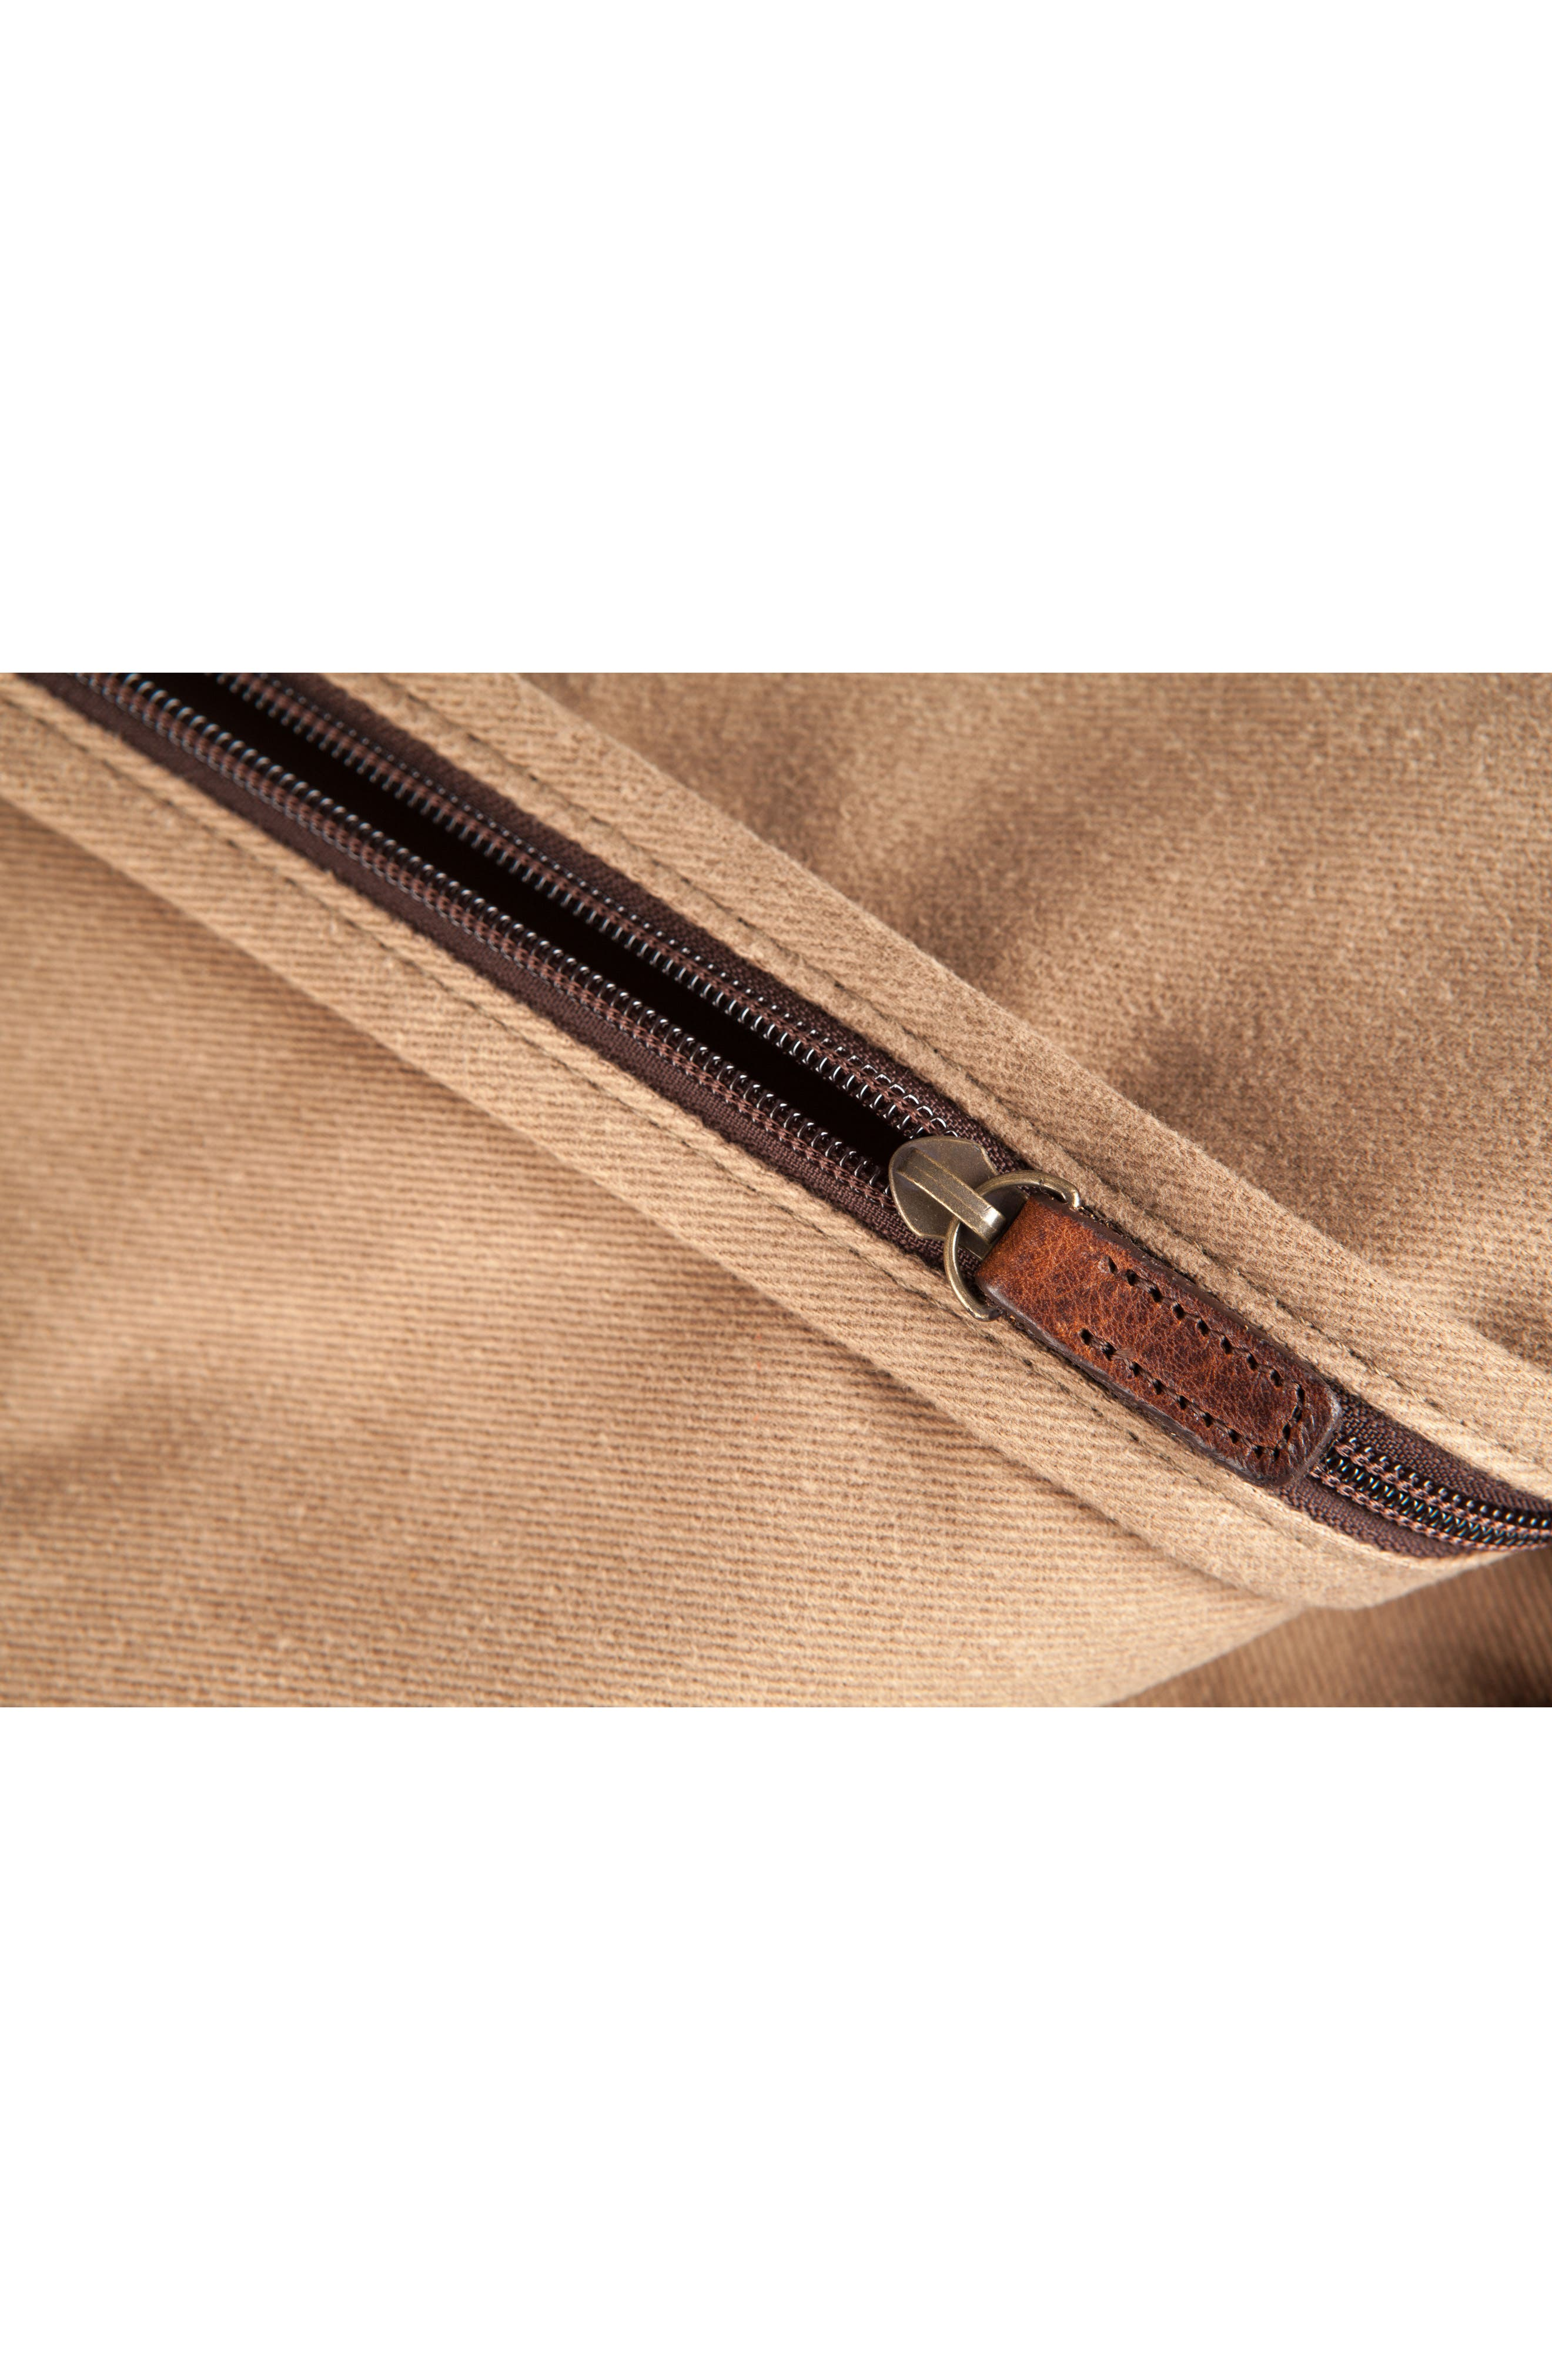 Holton Garment Bag,                             Alternate thumbnail 6, color,                             Brushed Tan Twill